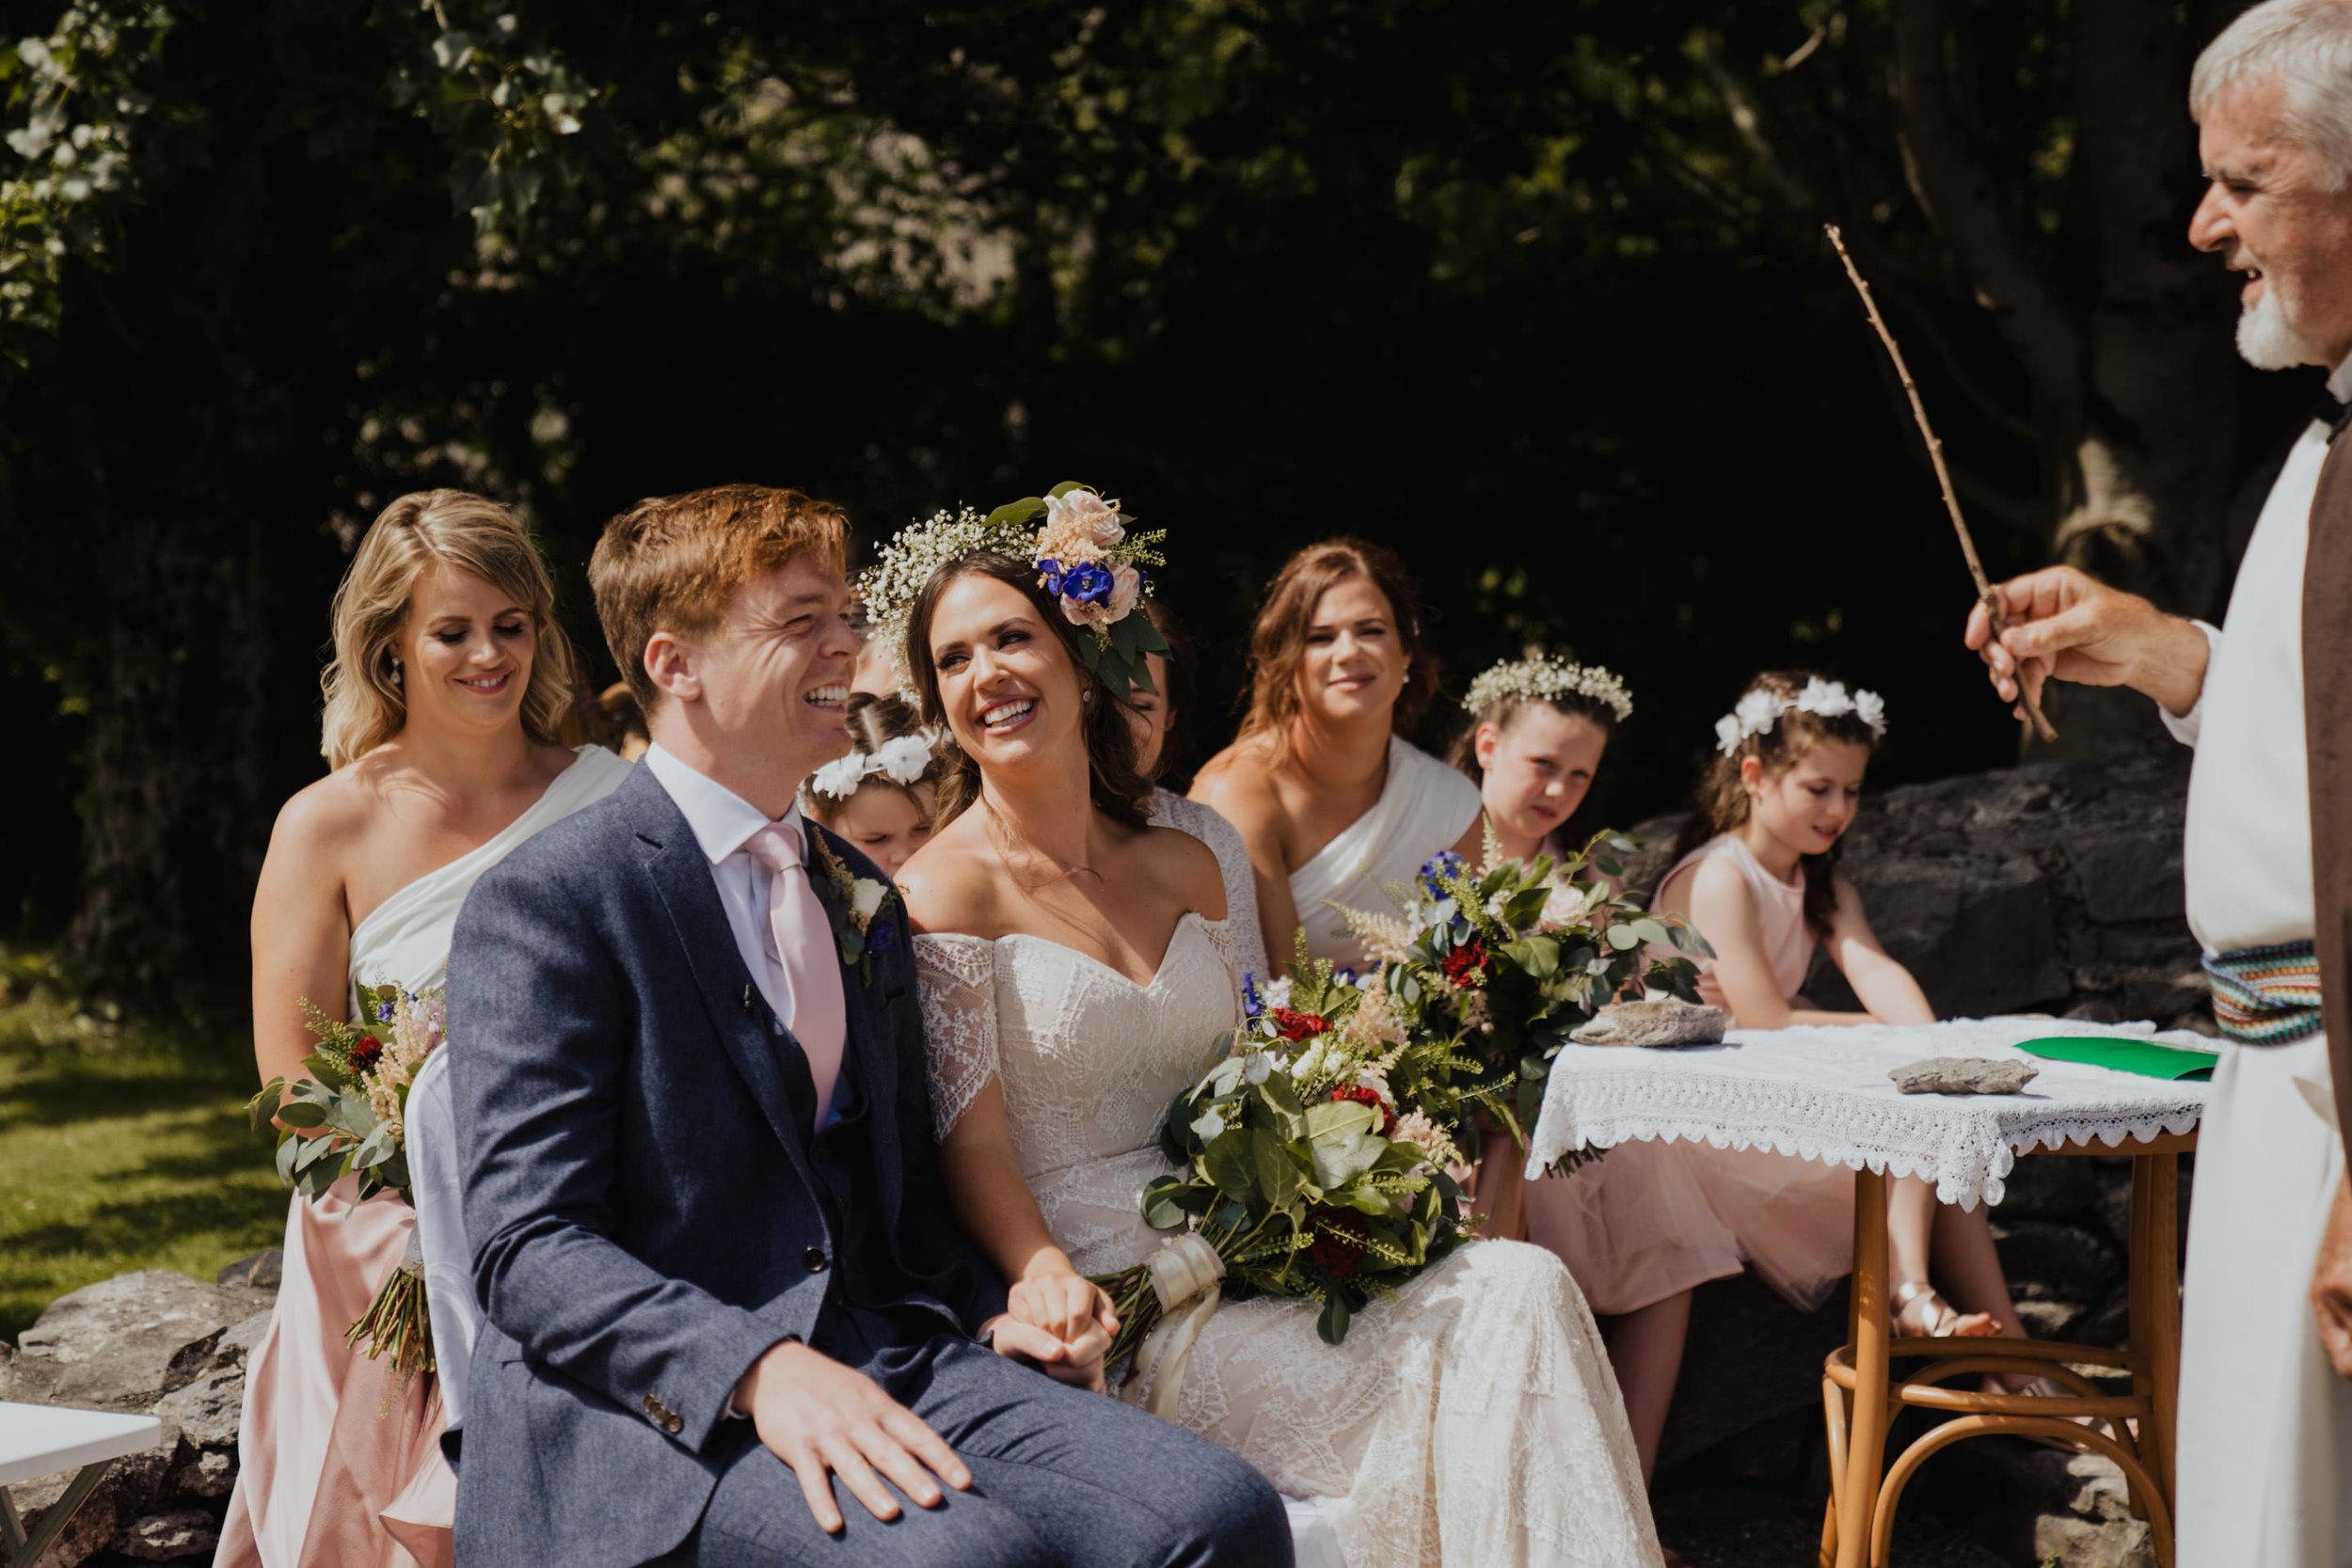 c&j_brigits_garden_galway_wedding_photographer_livia_figueiredo_23.jpg